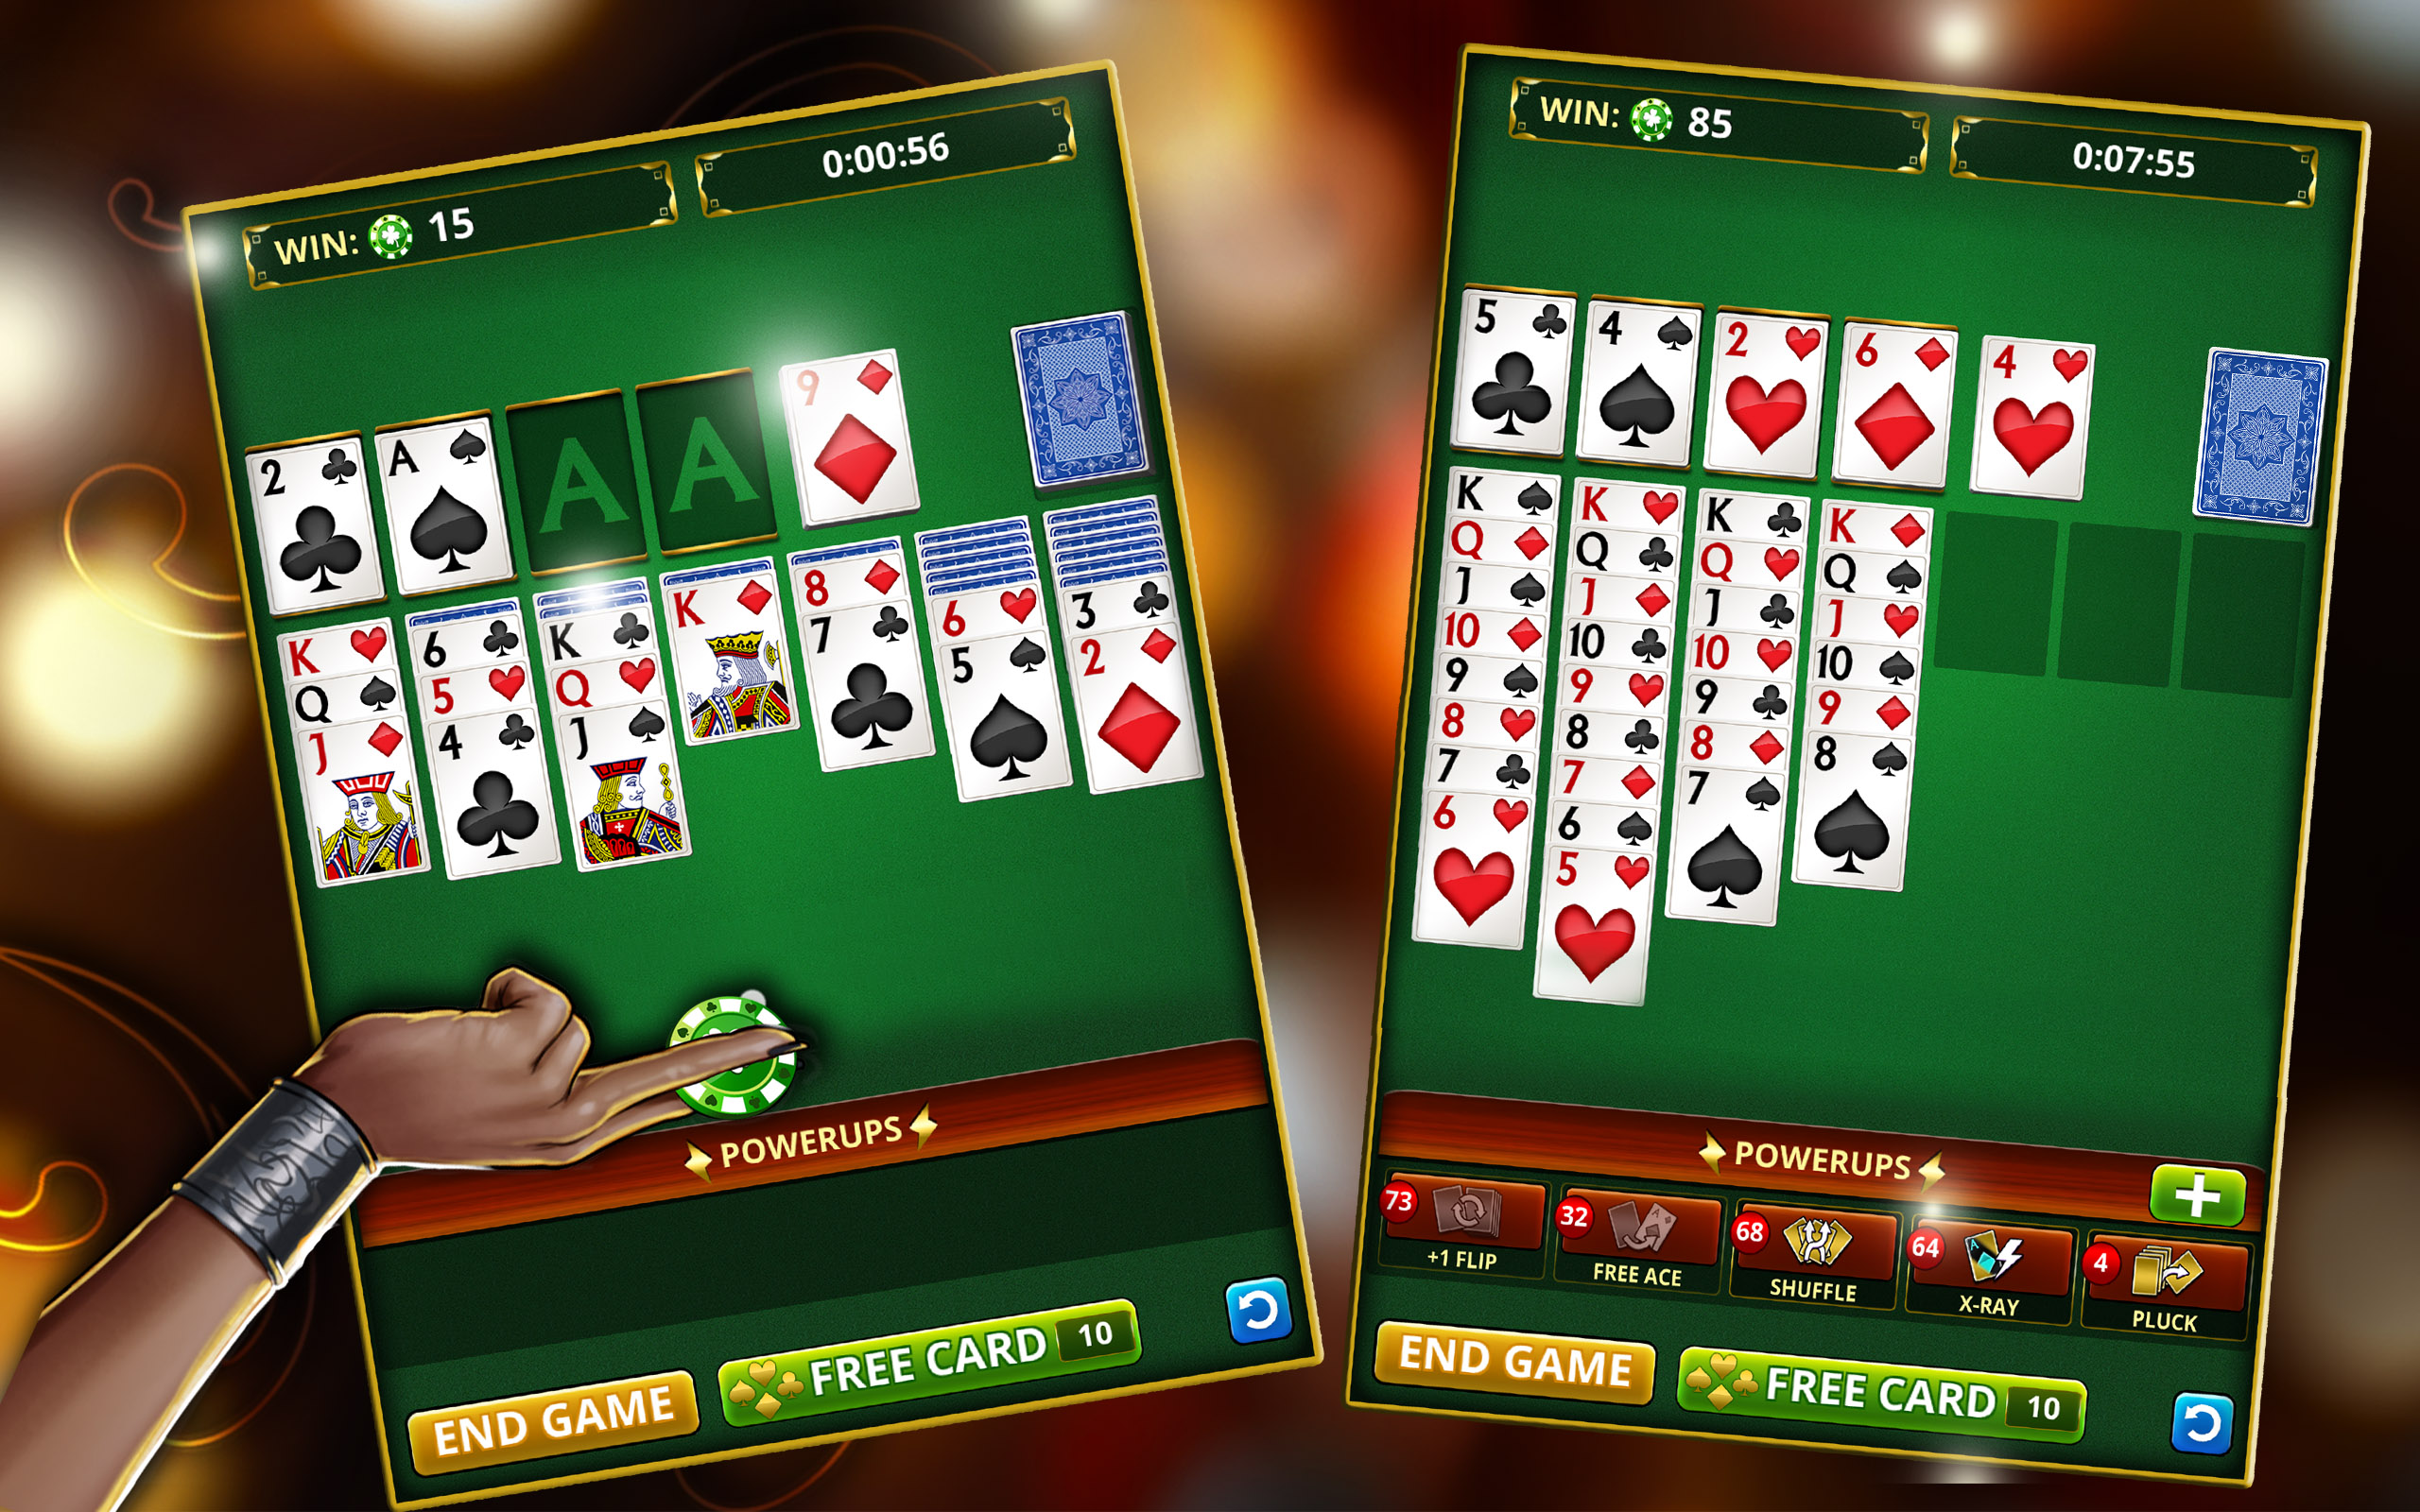 beste online casino automatenspiele kostenlos downloaden